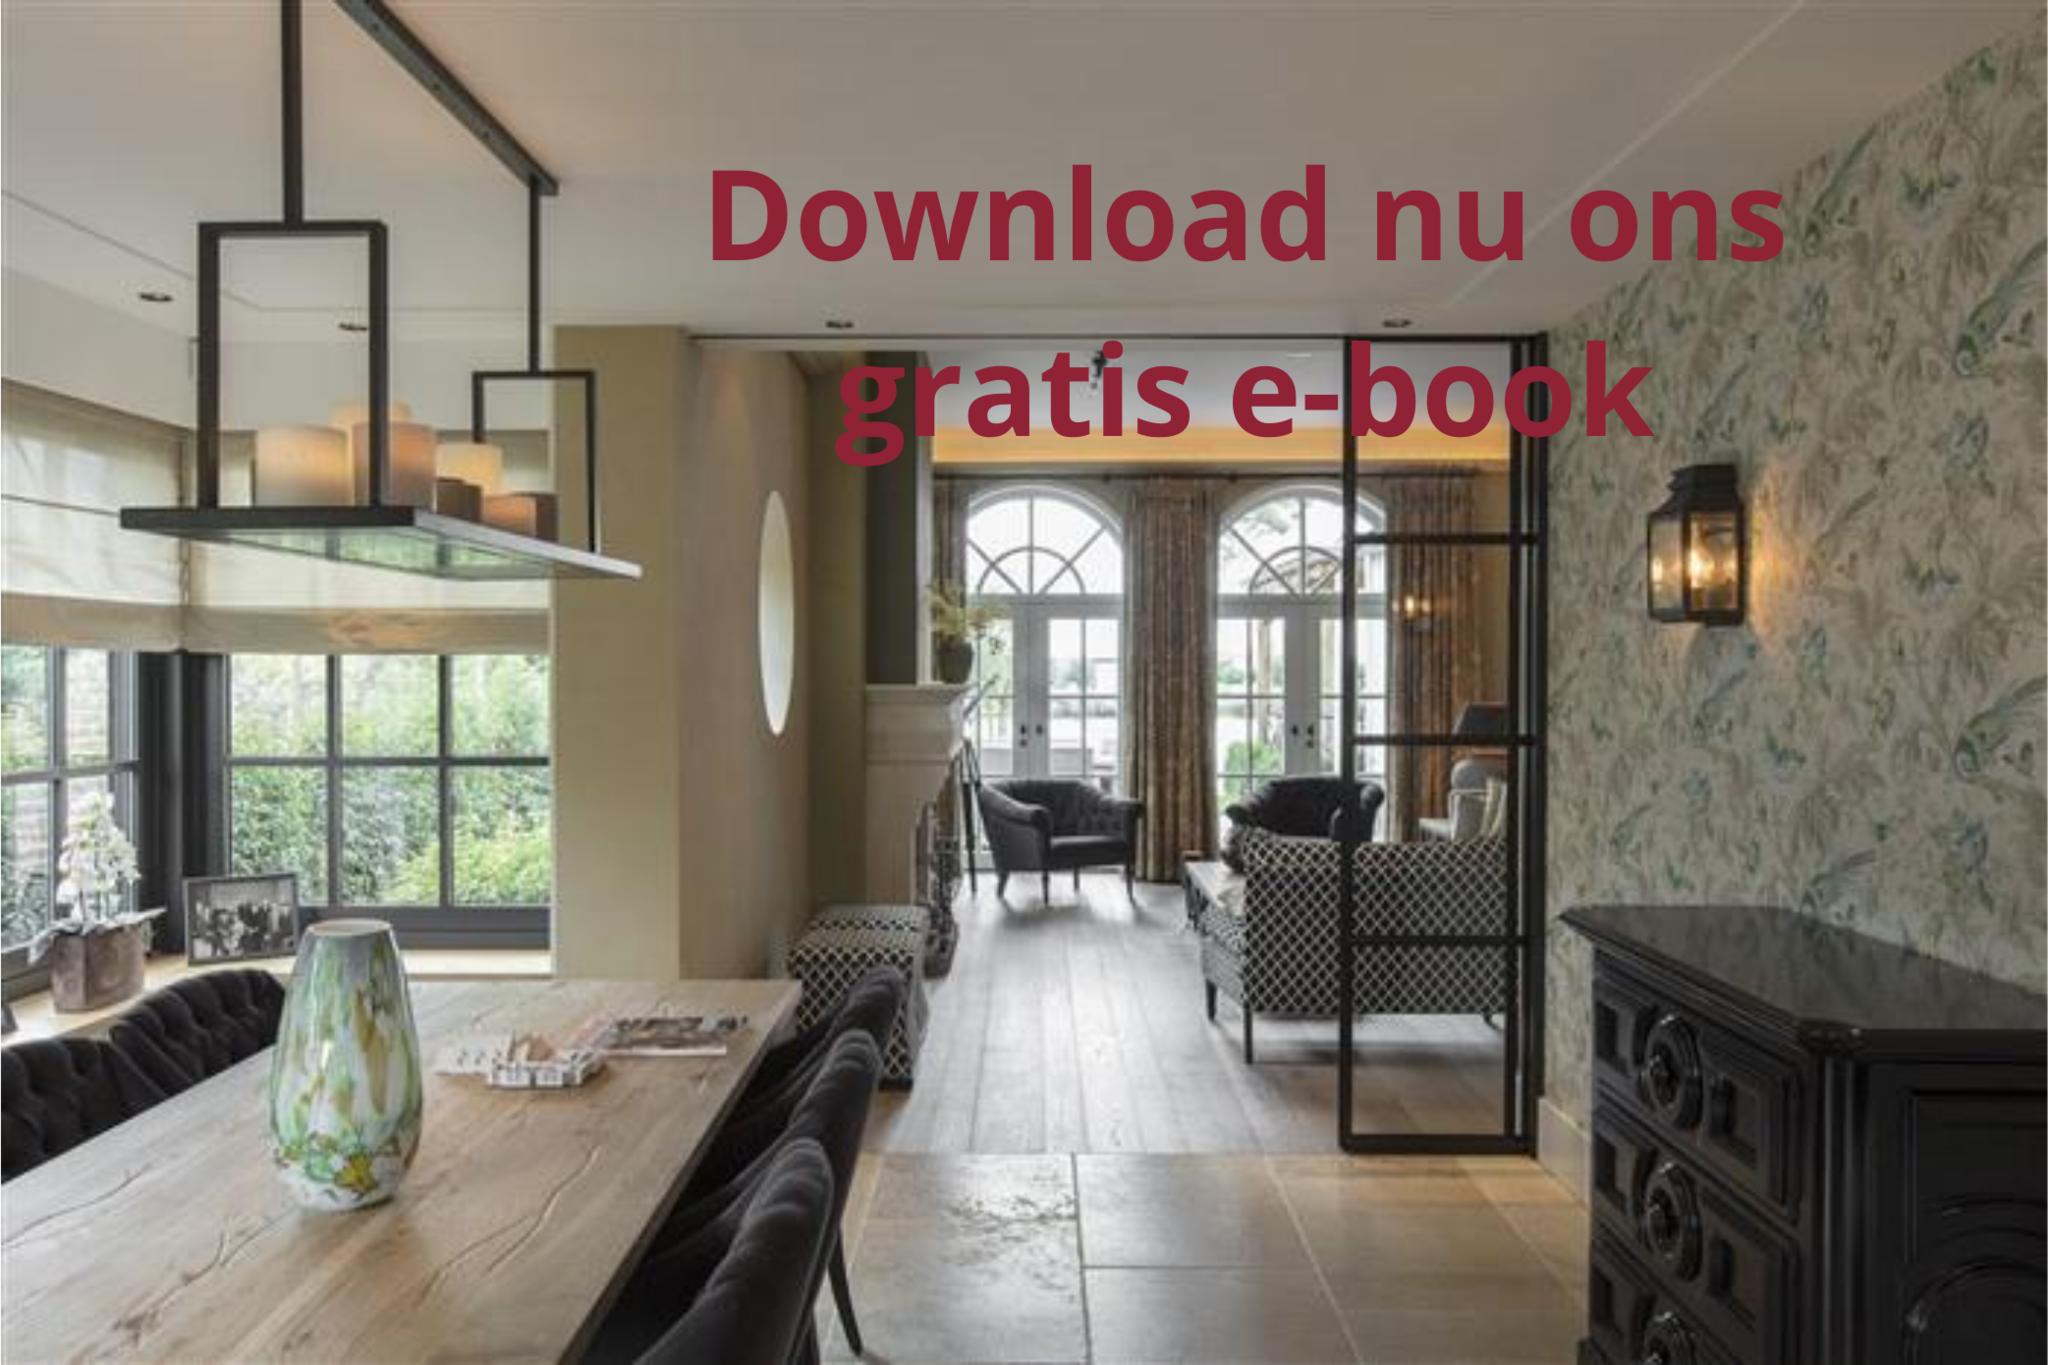 Gratis e-book landelijke verlichting